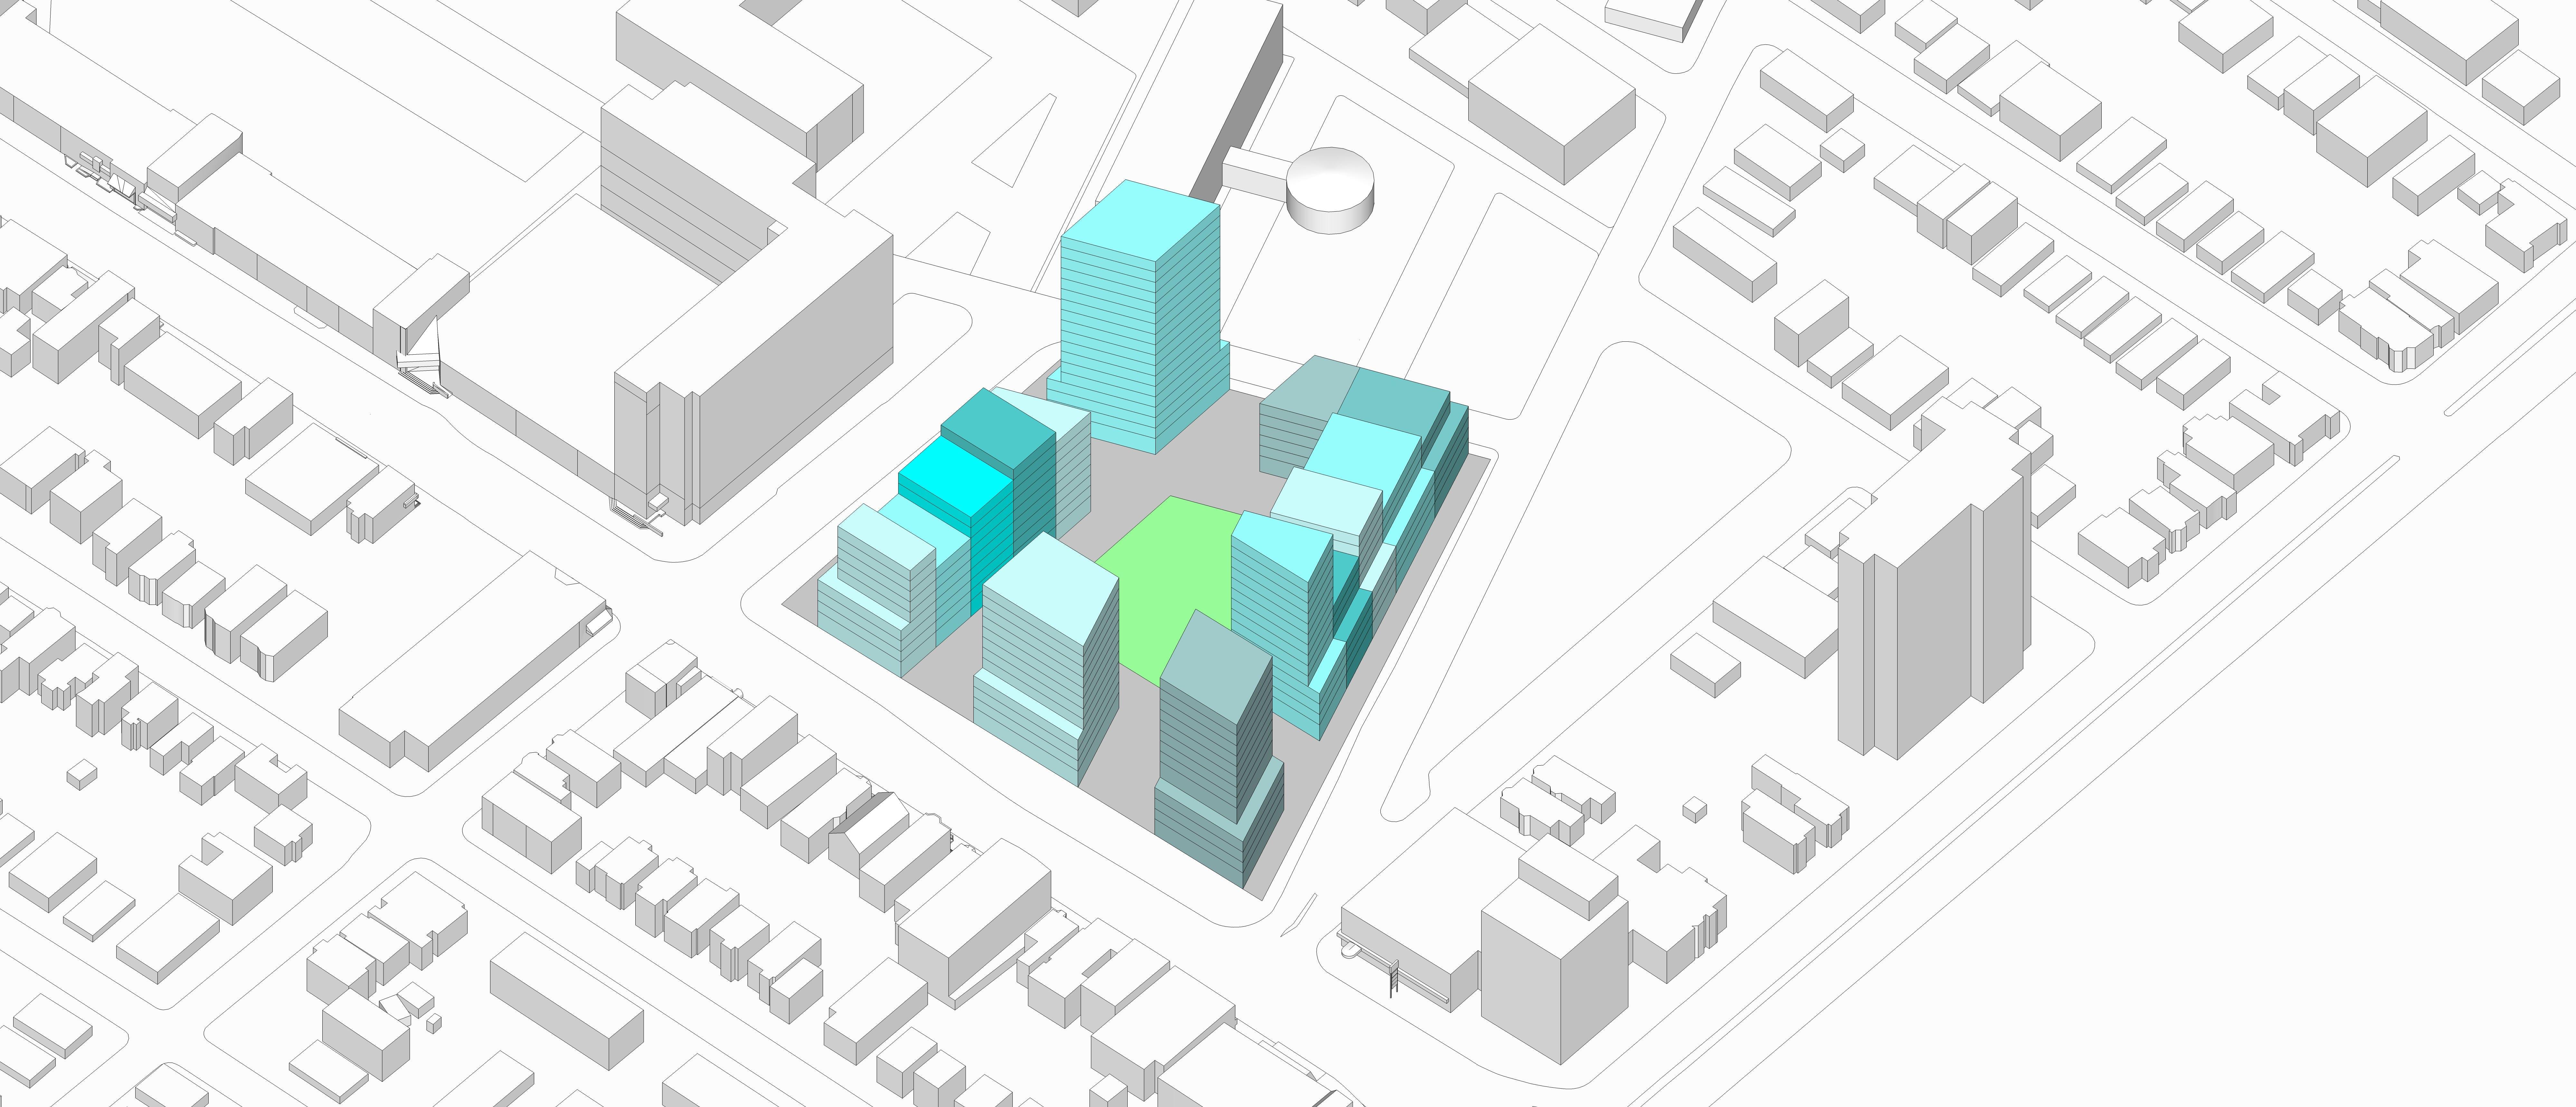 Creativity in Design - Multi-Family Buildings - example 1